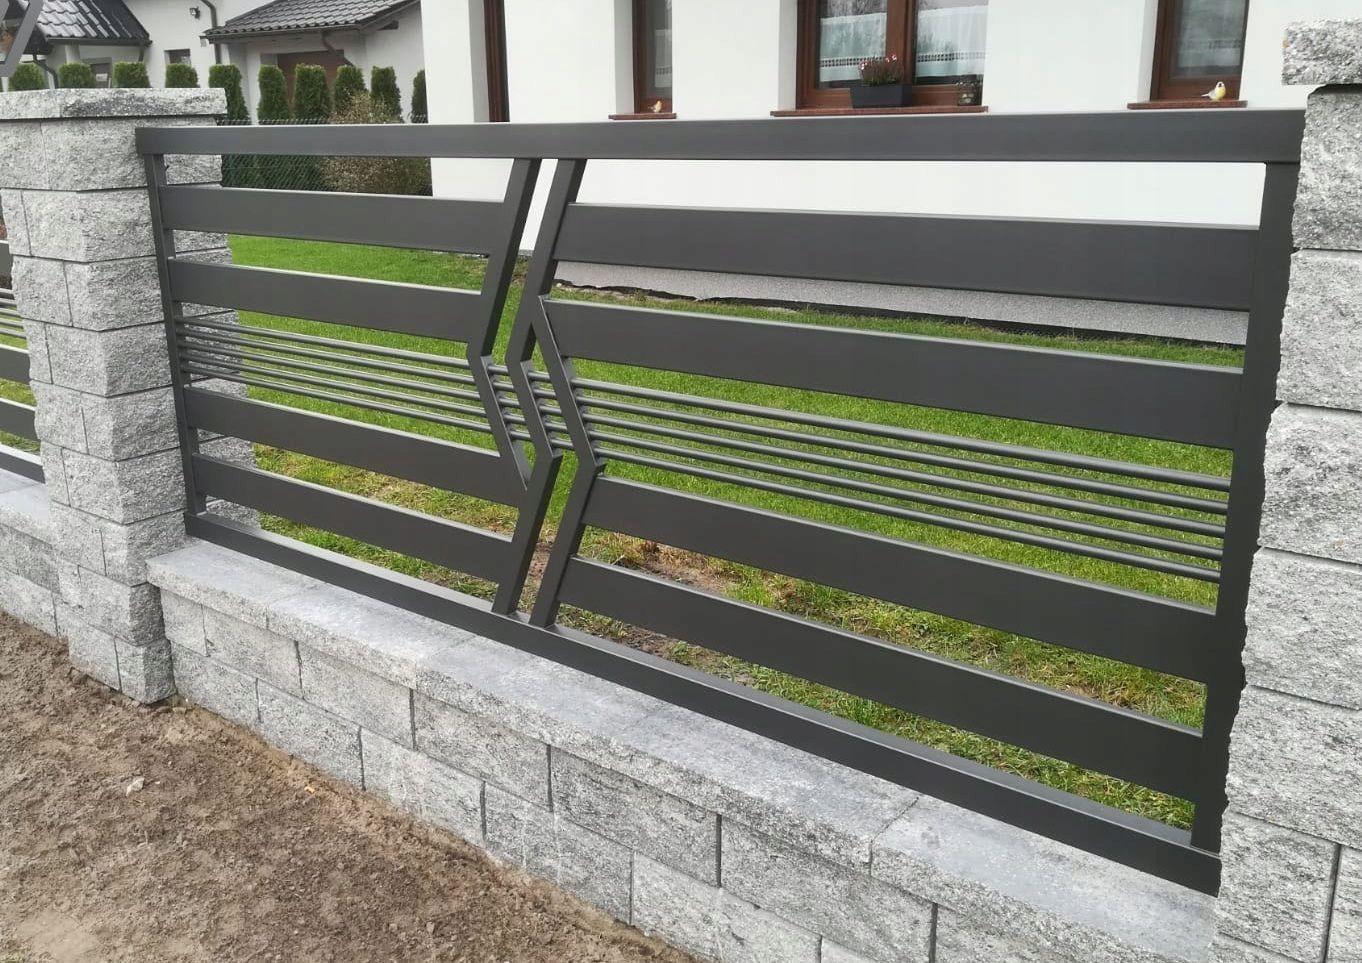 Nowoczesne Ogrodzenia Panel Plot Brama 369 Nha Cửa Cửa Sổ